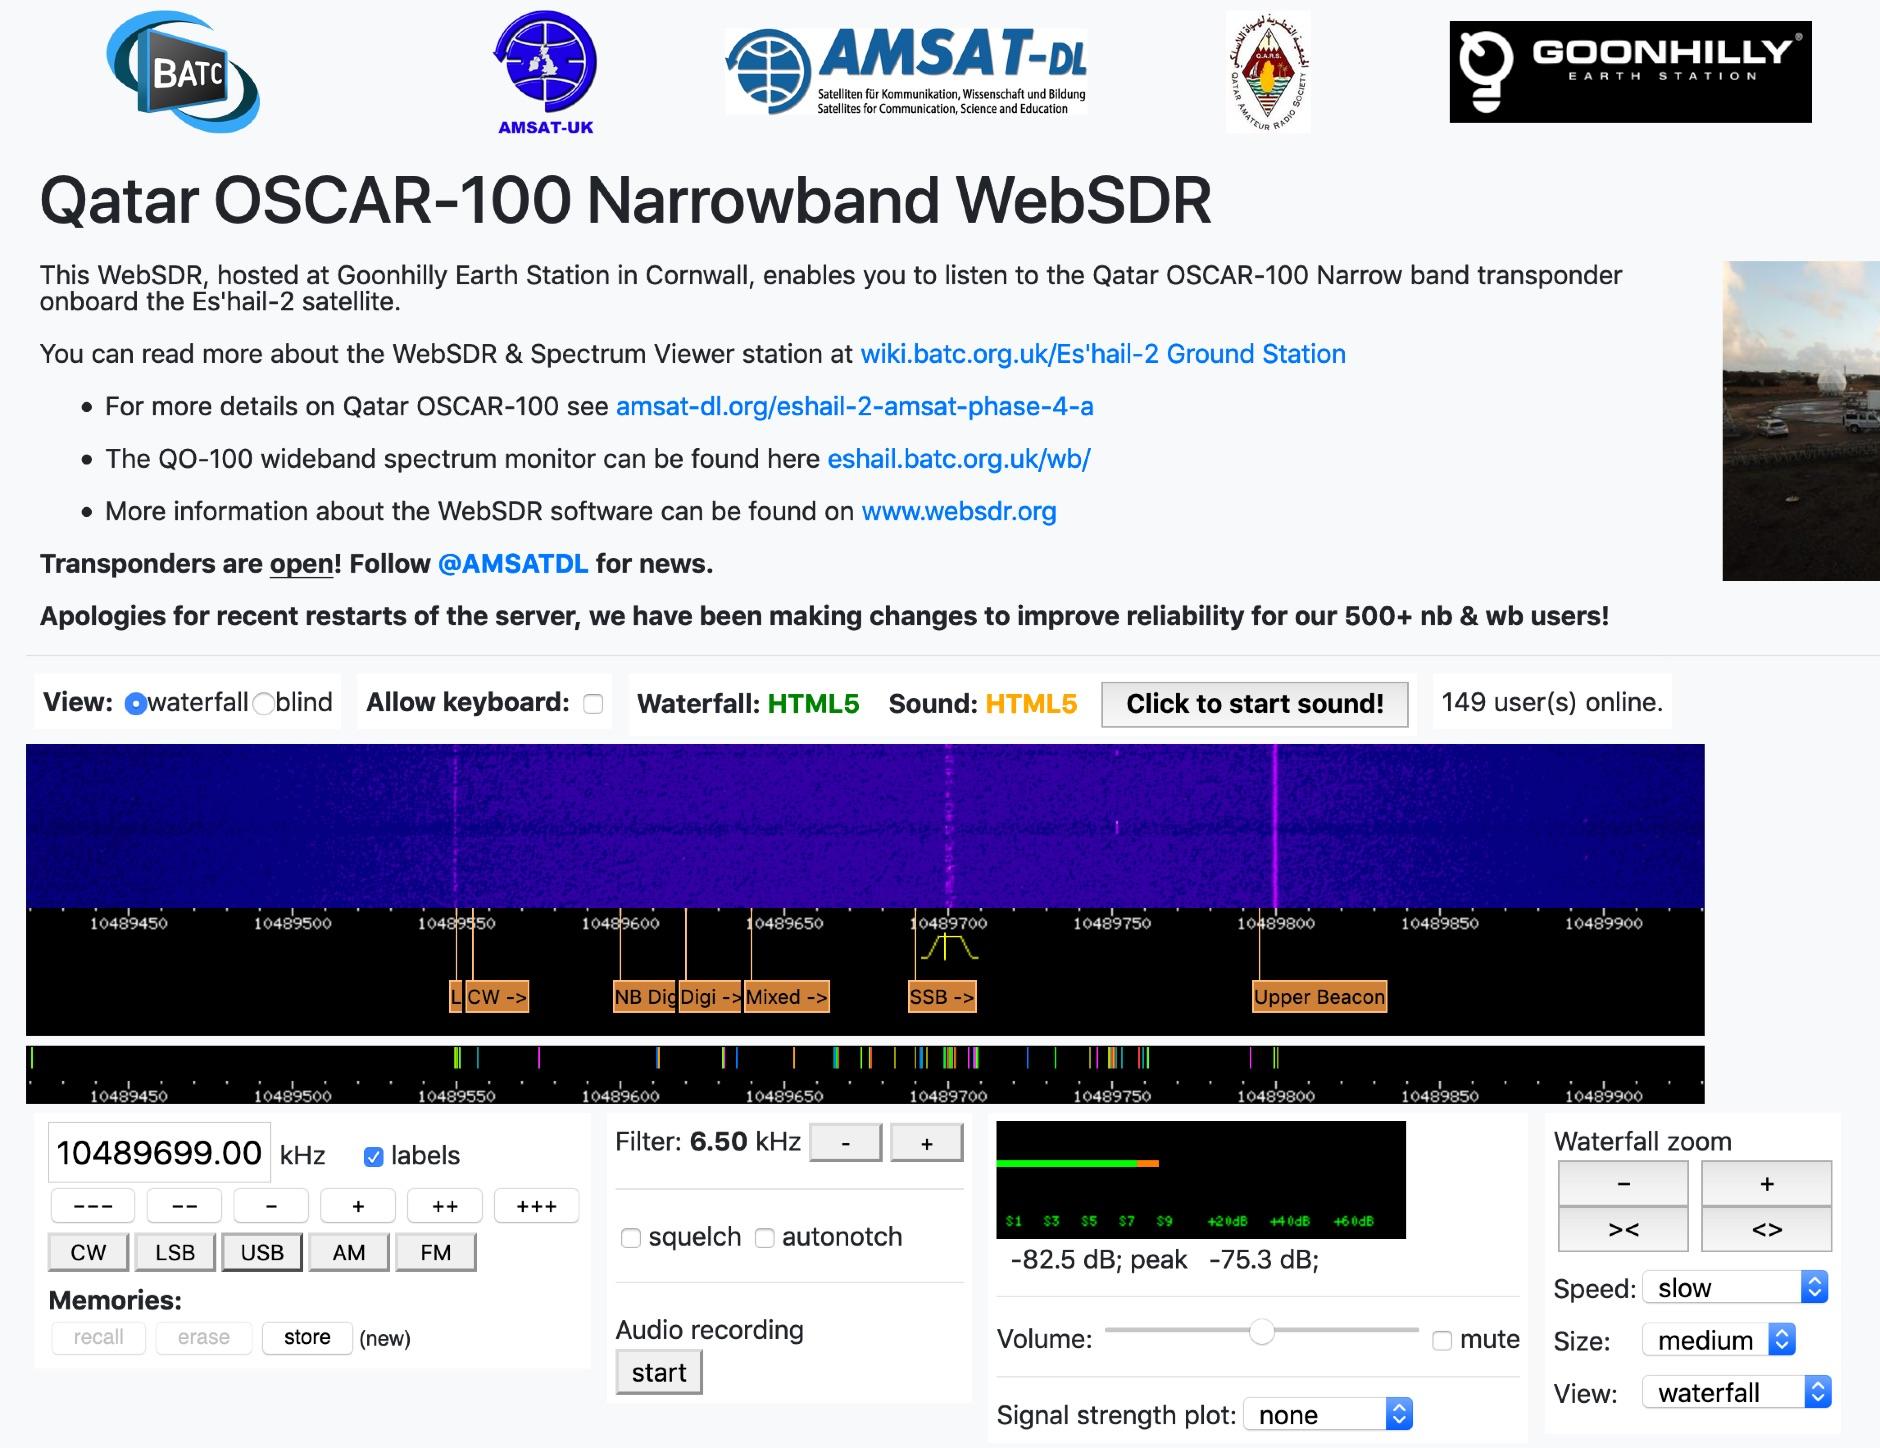 OSCAR-100 WebSDR